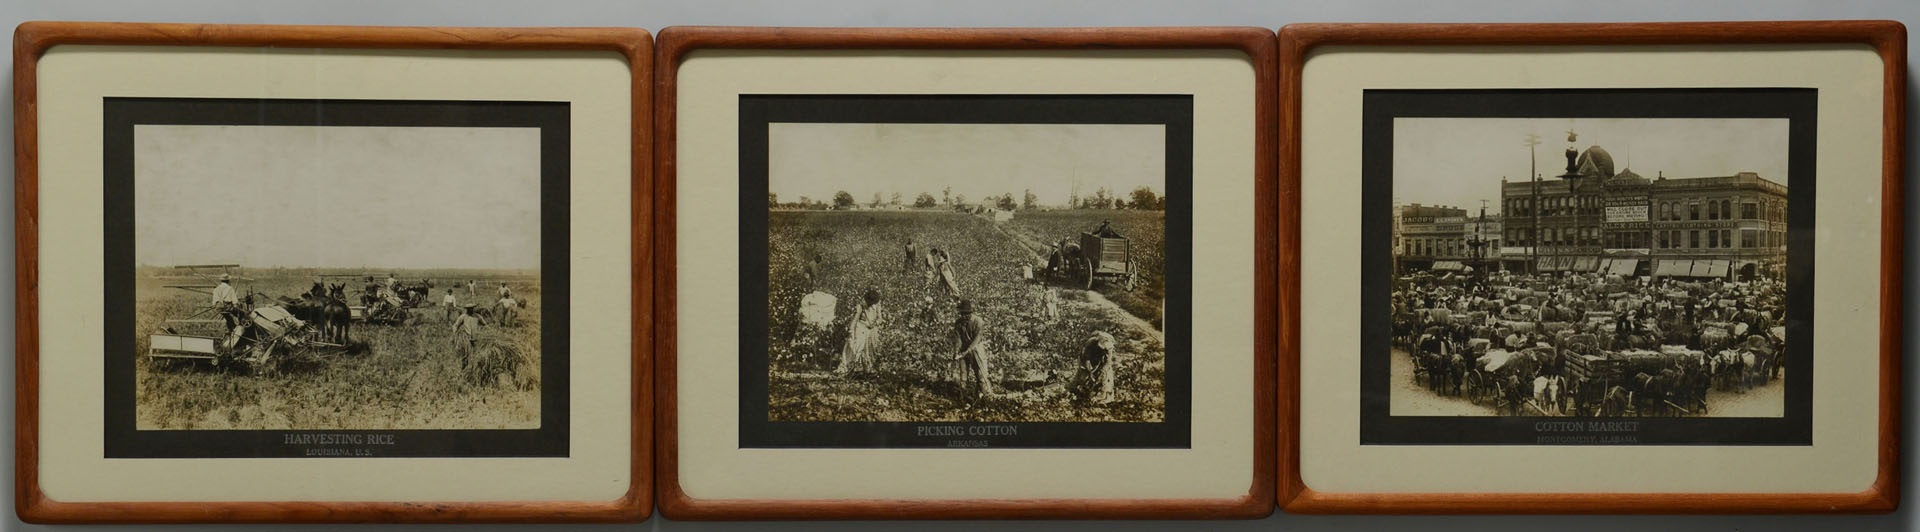 3 Albumen Prints, Southern Interest, early 20th c.